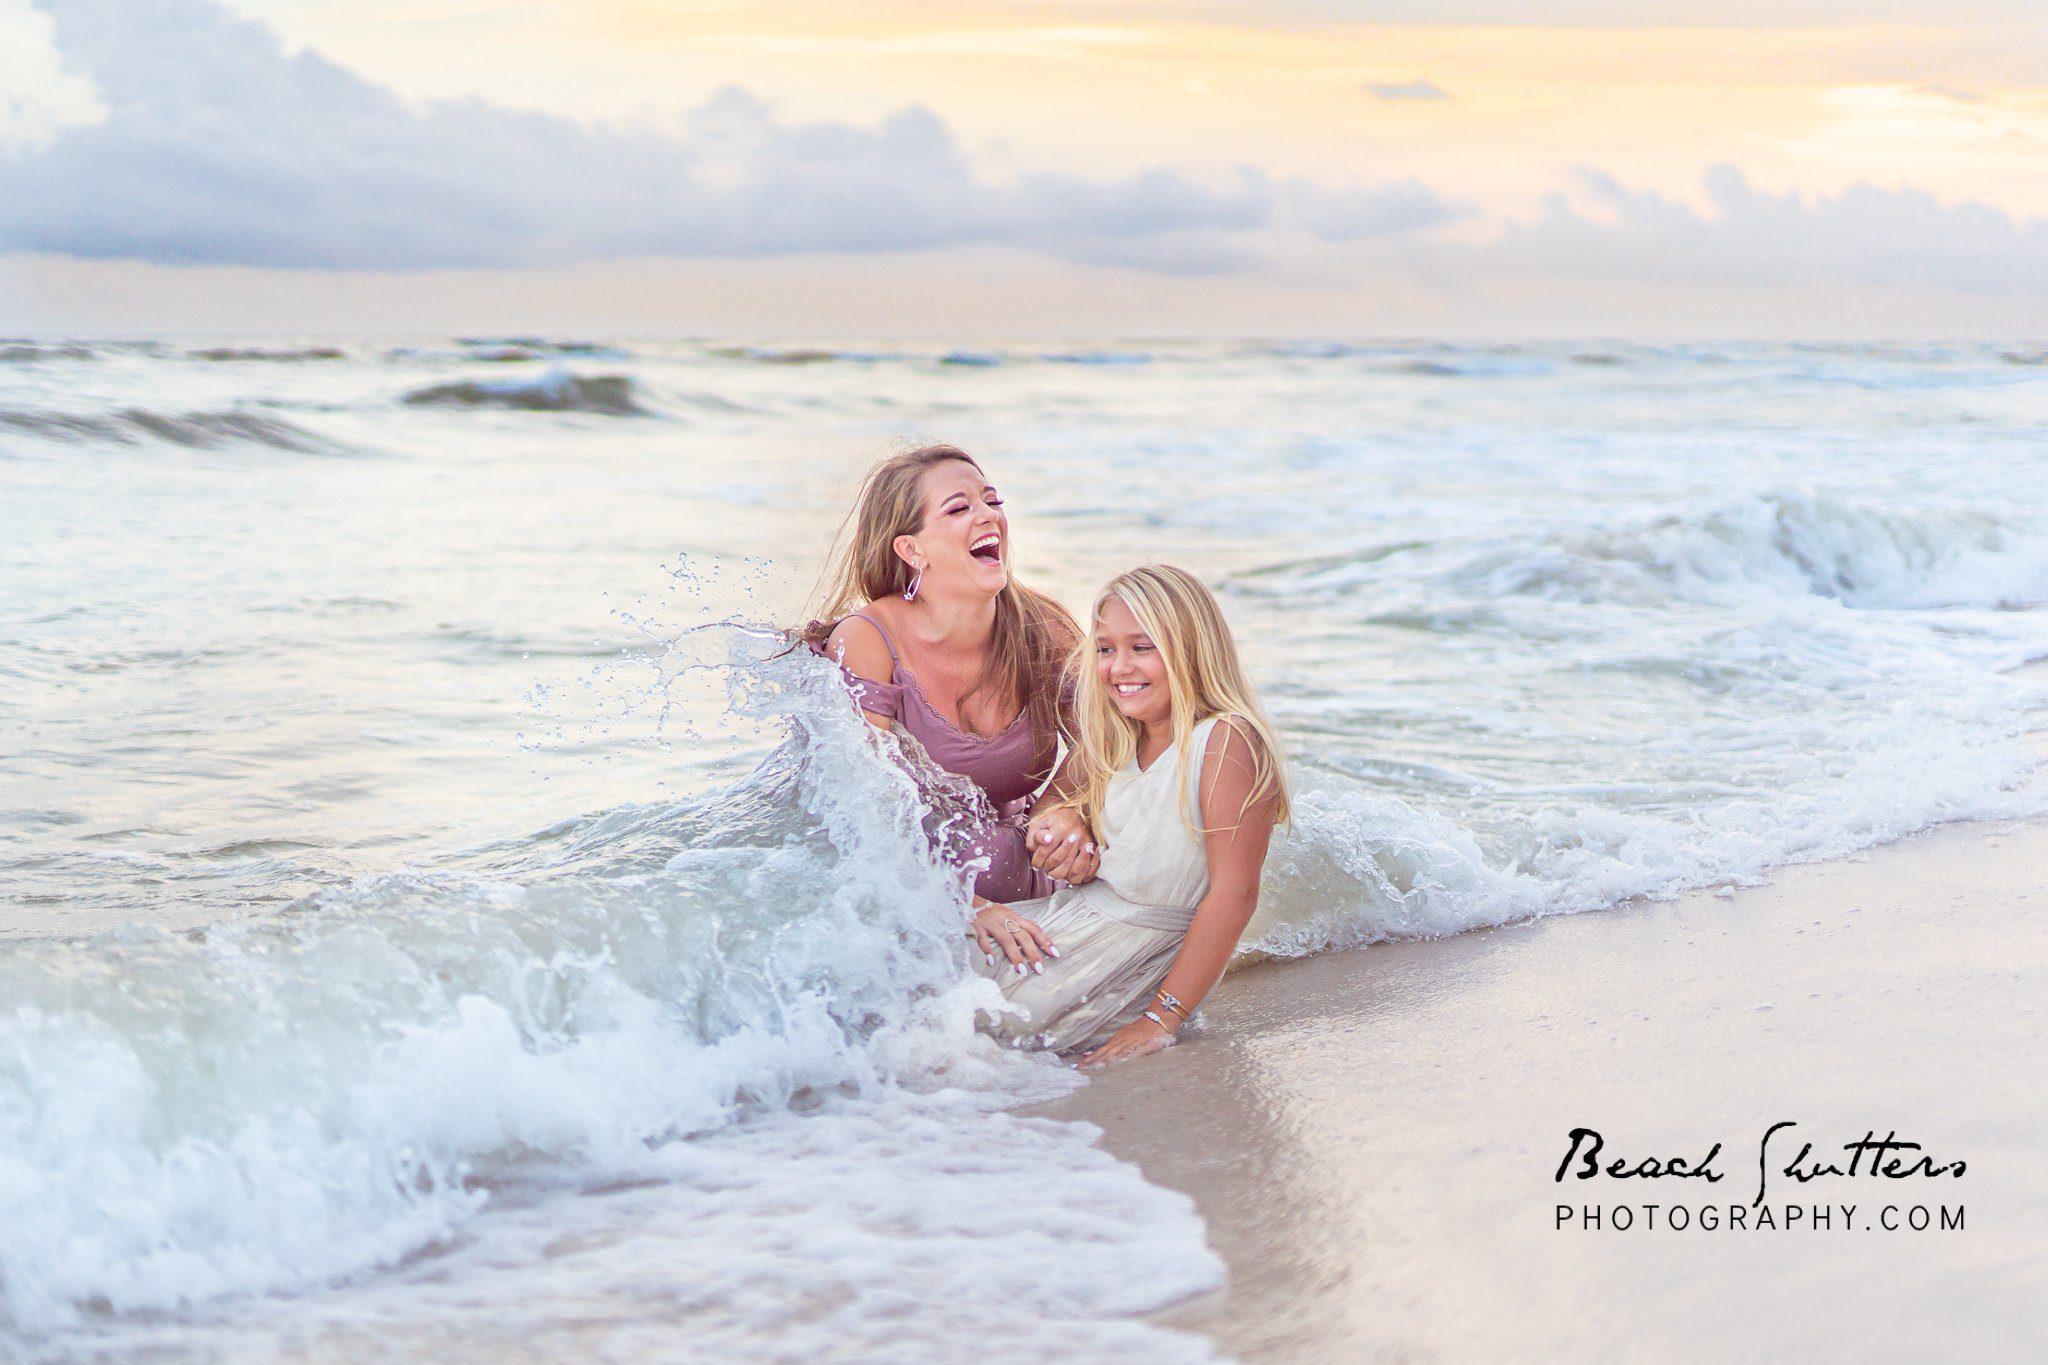 West Beach photographers